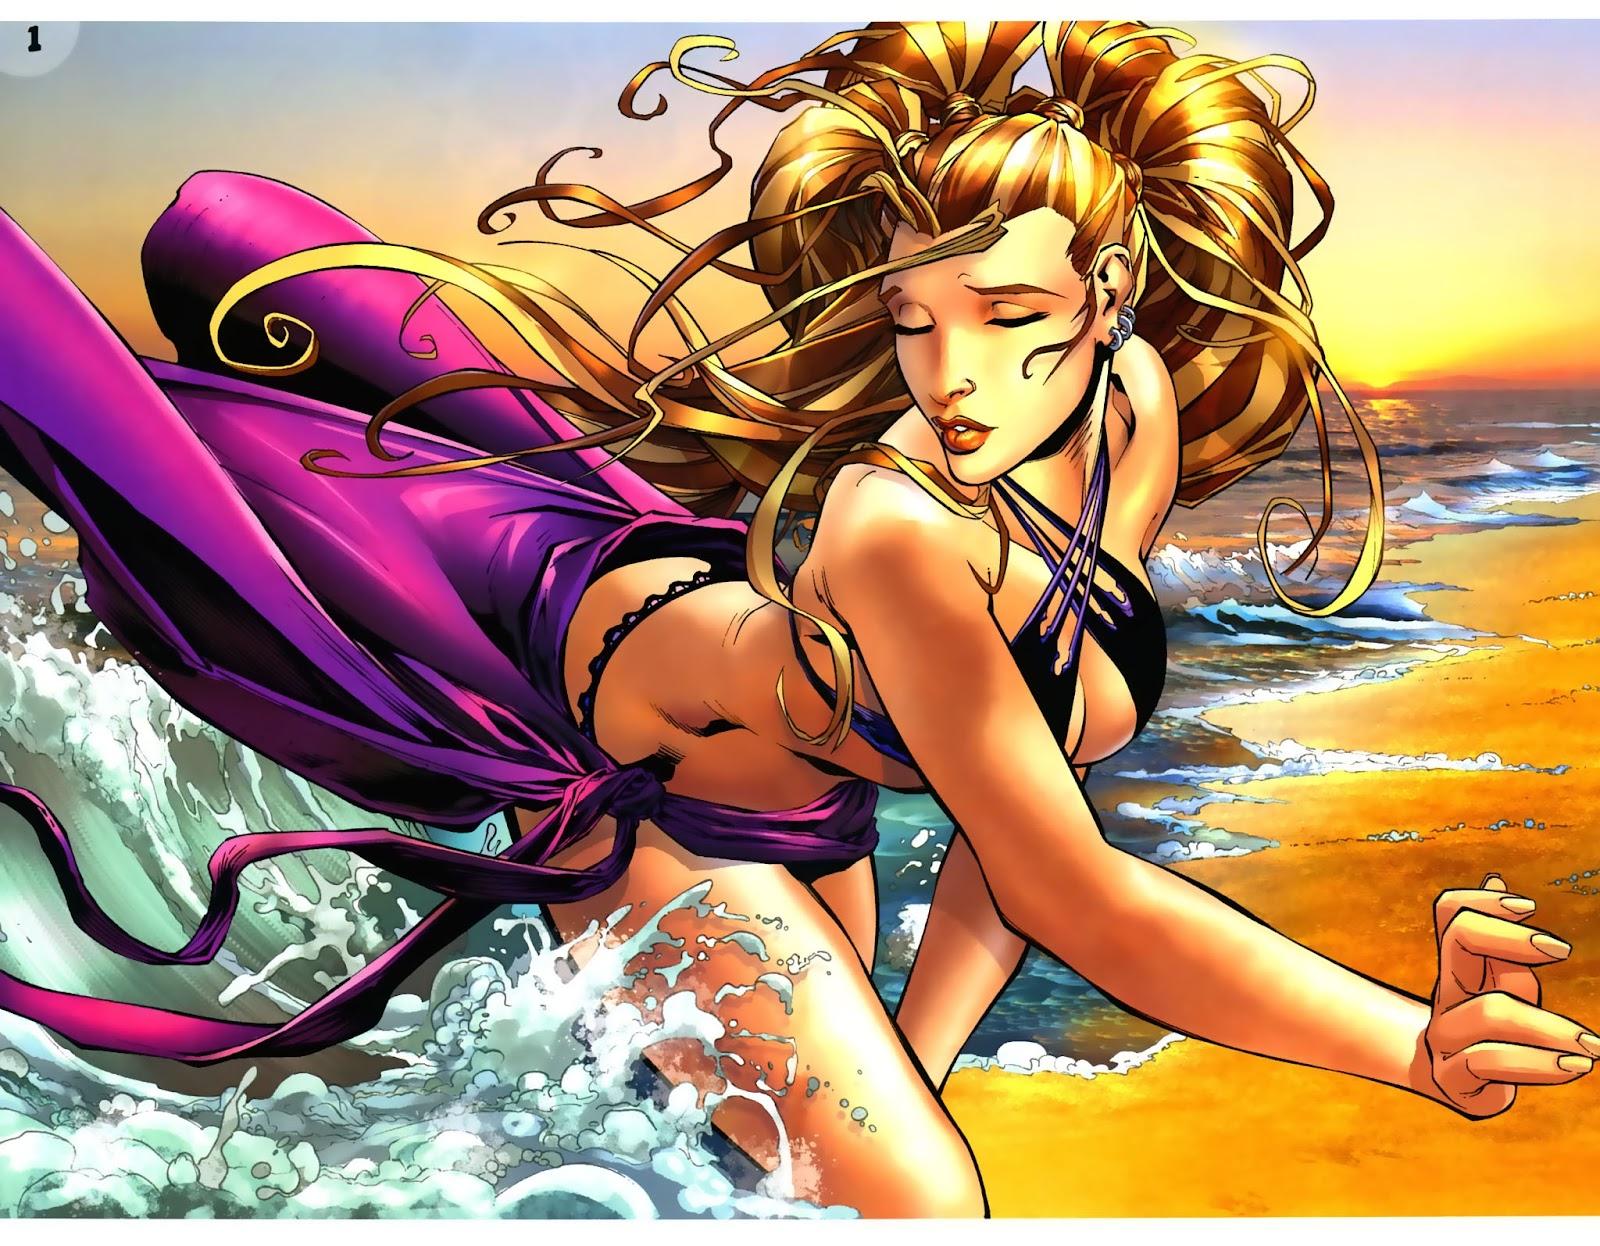 Read online Aspen Splash: Swimsuit Spectacular comic -  Issue # Issue 2006 - 3